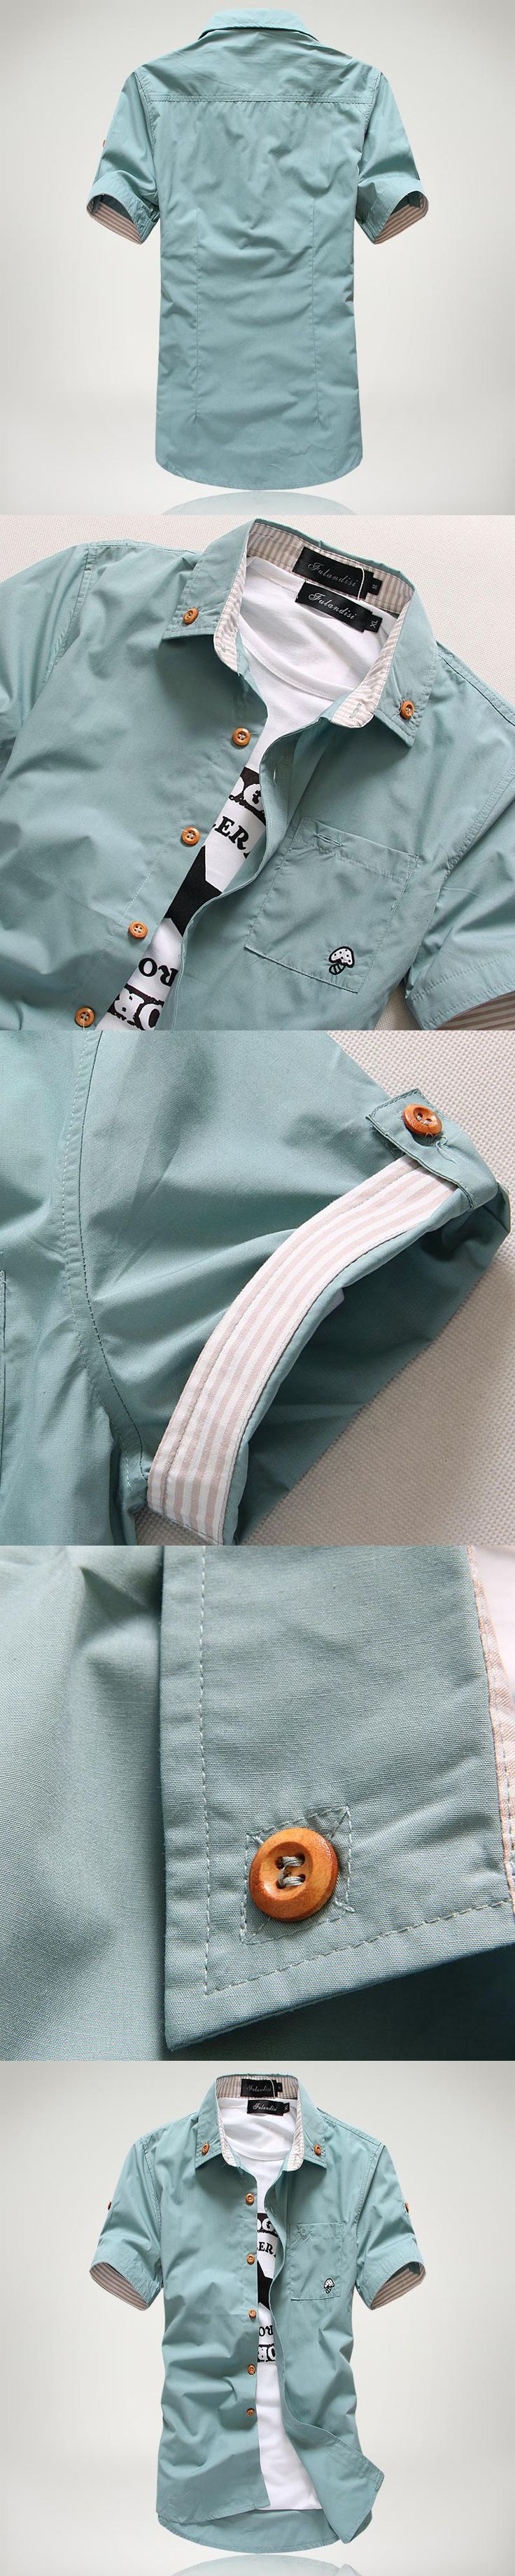 casual men short sleeve shirt polo fashion Mushroom Embroidery slim fit cotton Men's shirts  wear for men shirts